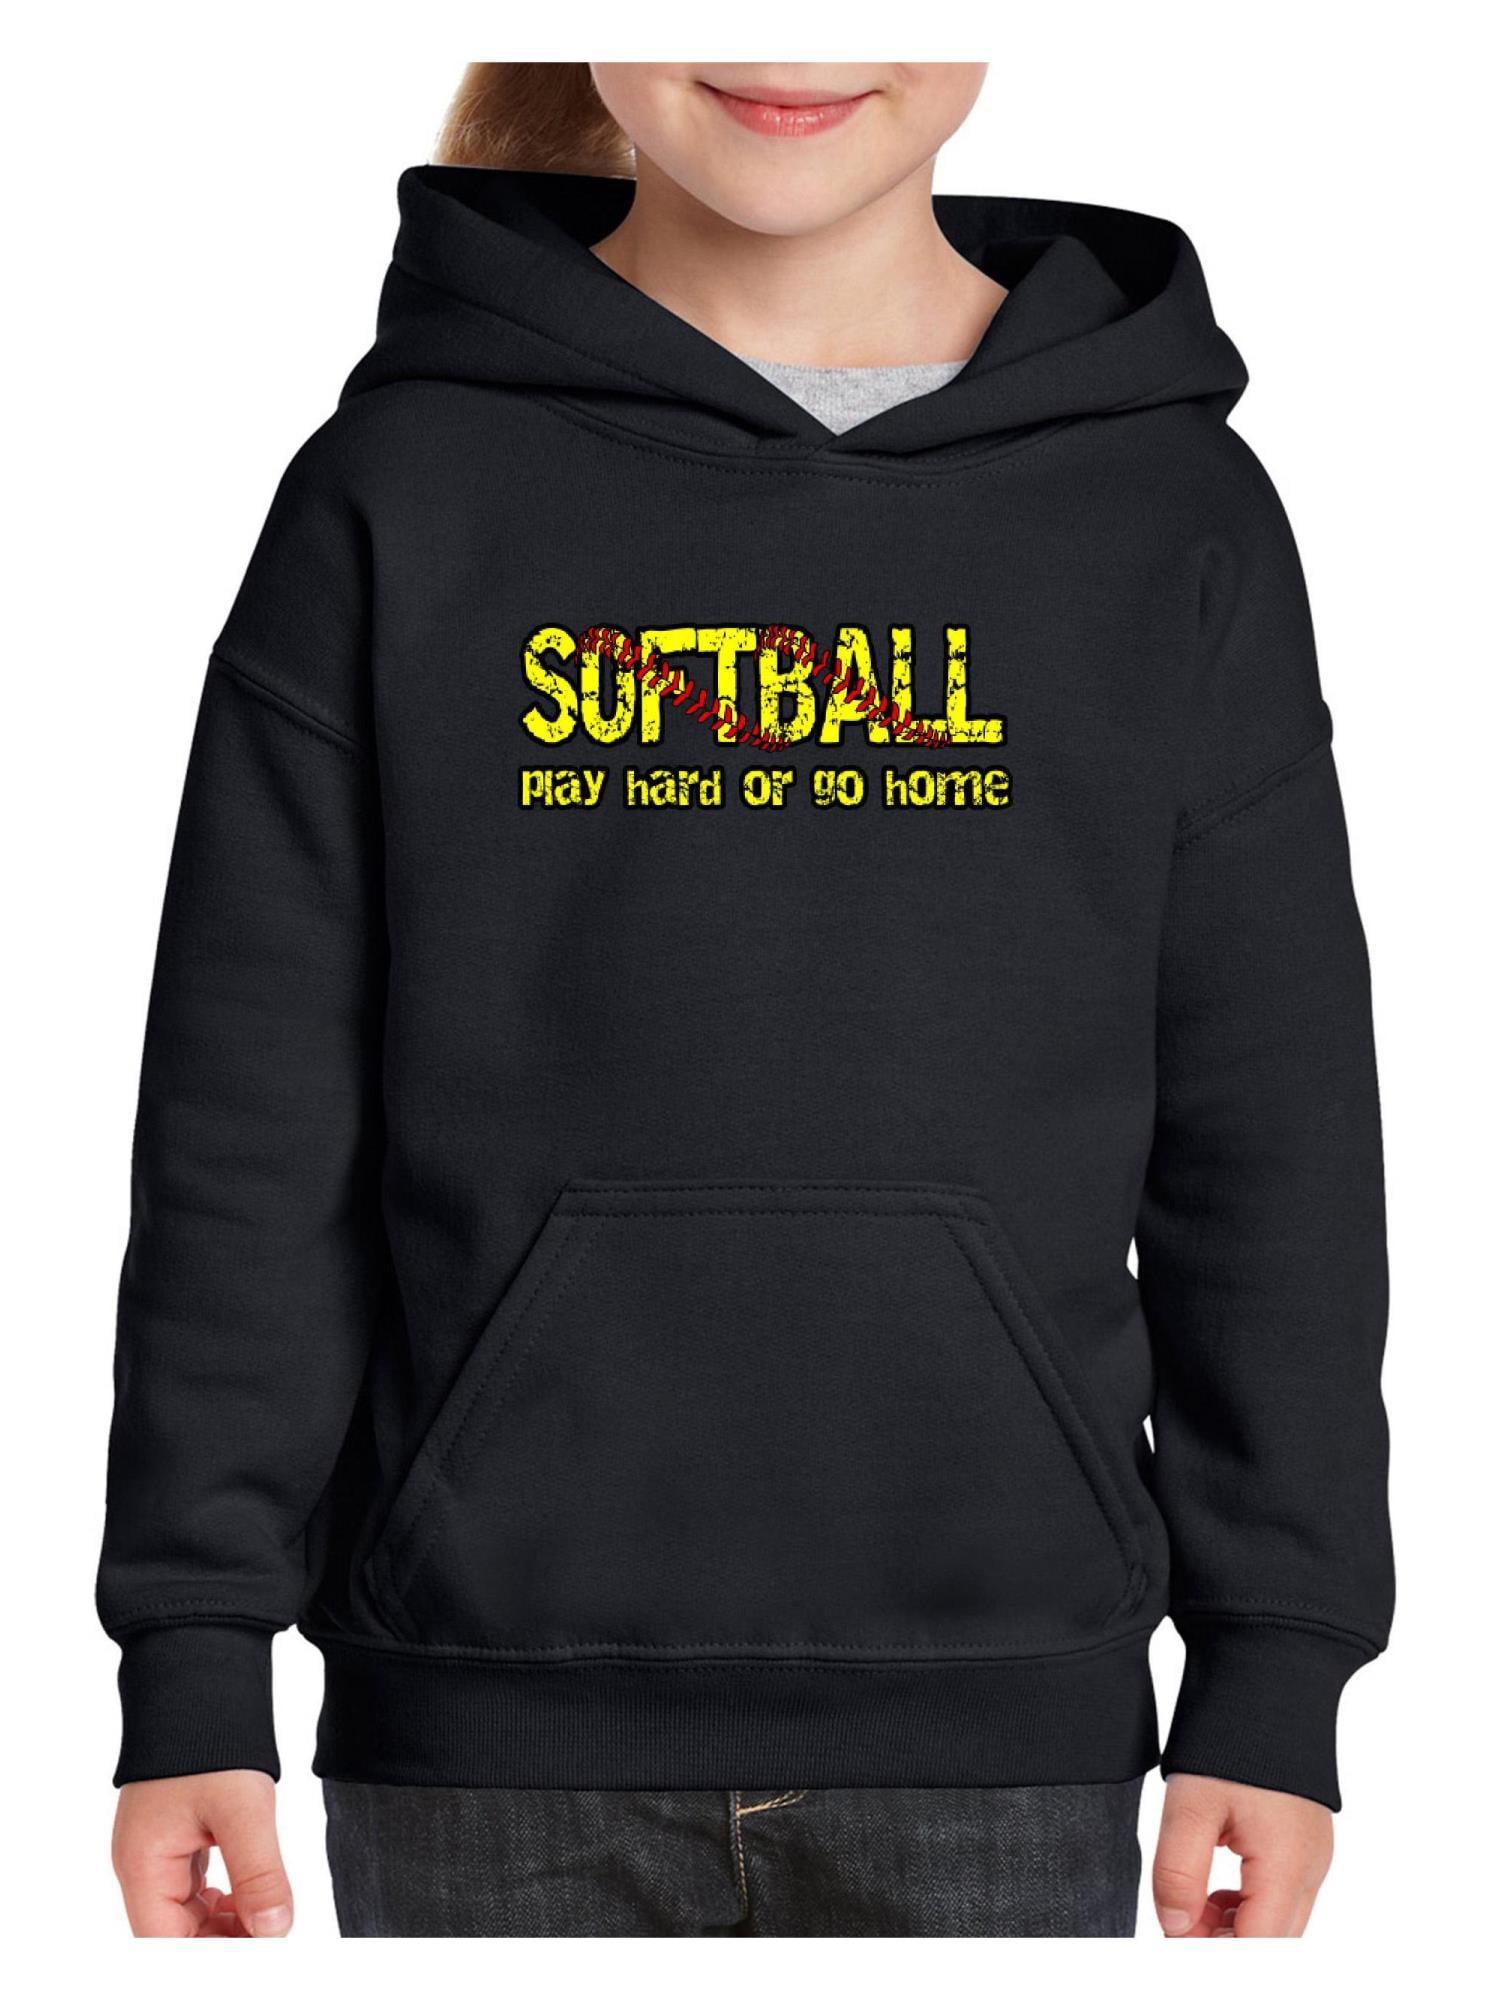 Softball Play Hard or Go Home Unisex Hoodie For Girls and Boys Youth Sweatshirt